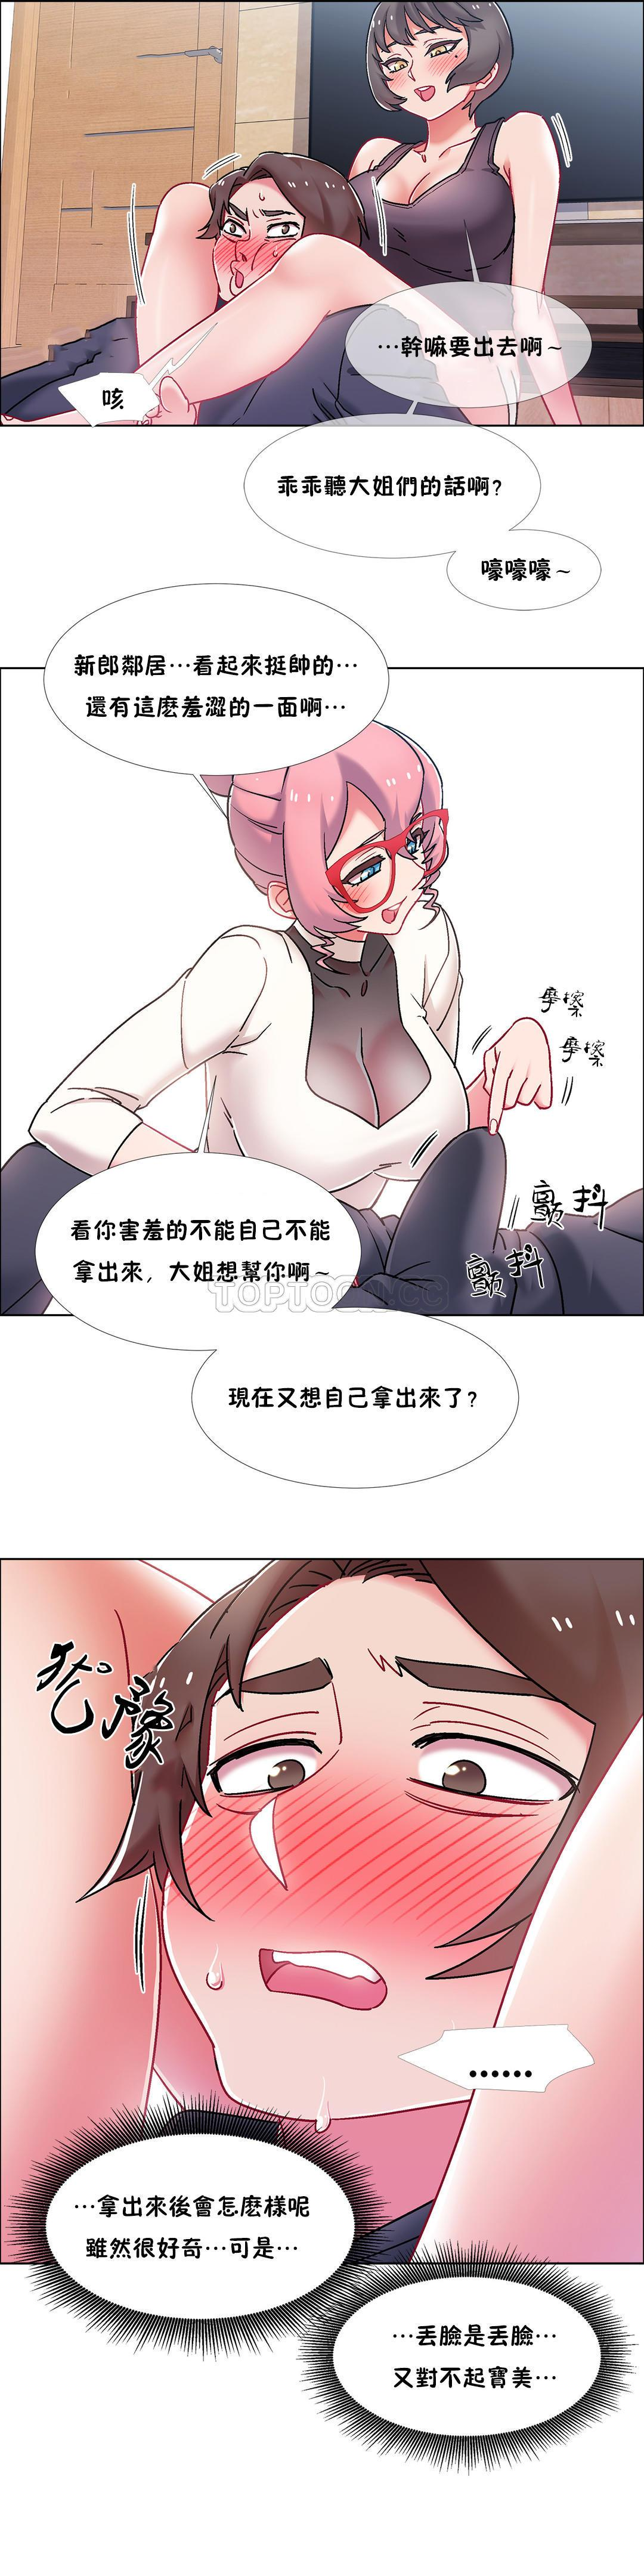 [Studio Wannabe] Rental Girls | 出租女郎 Ch. 33-58 [Chinese]  第二季 完结 336